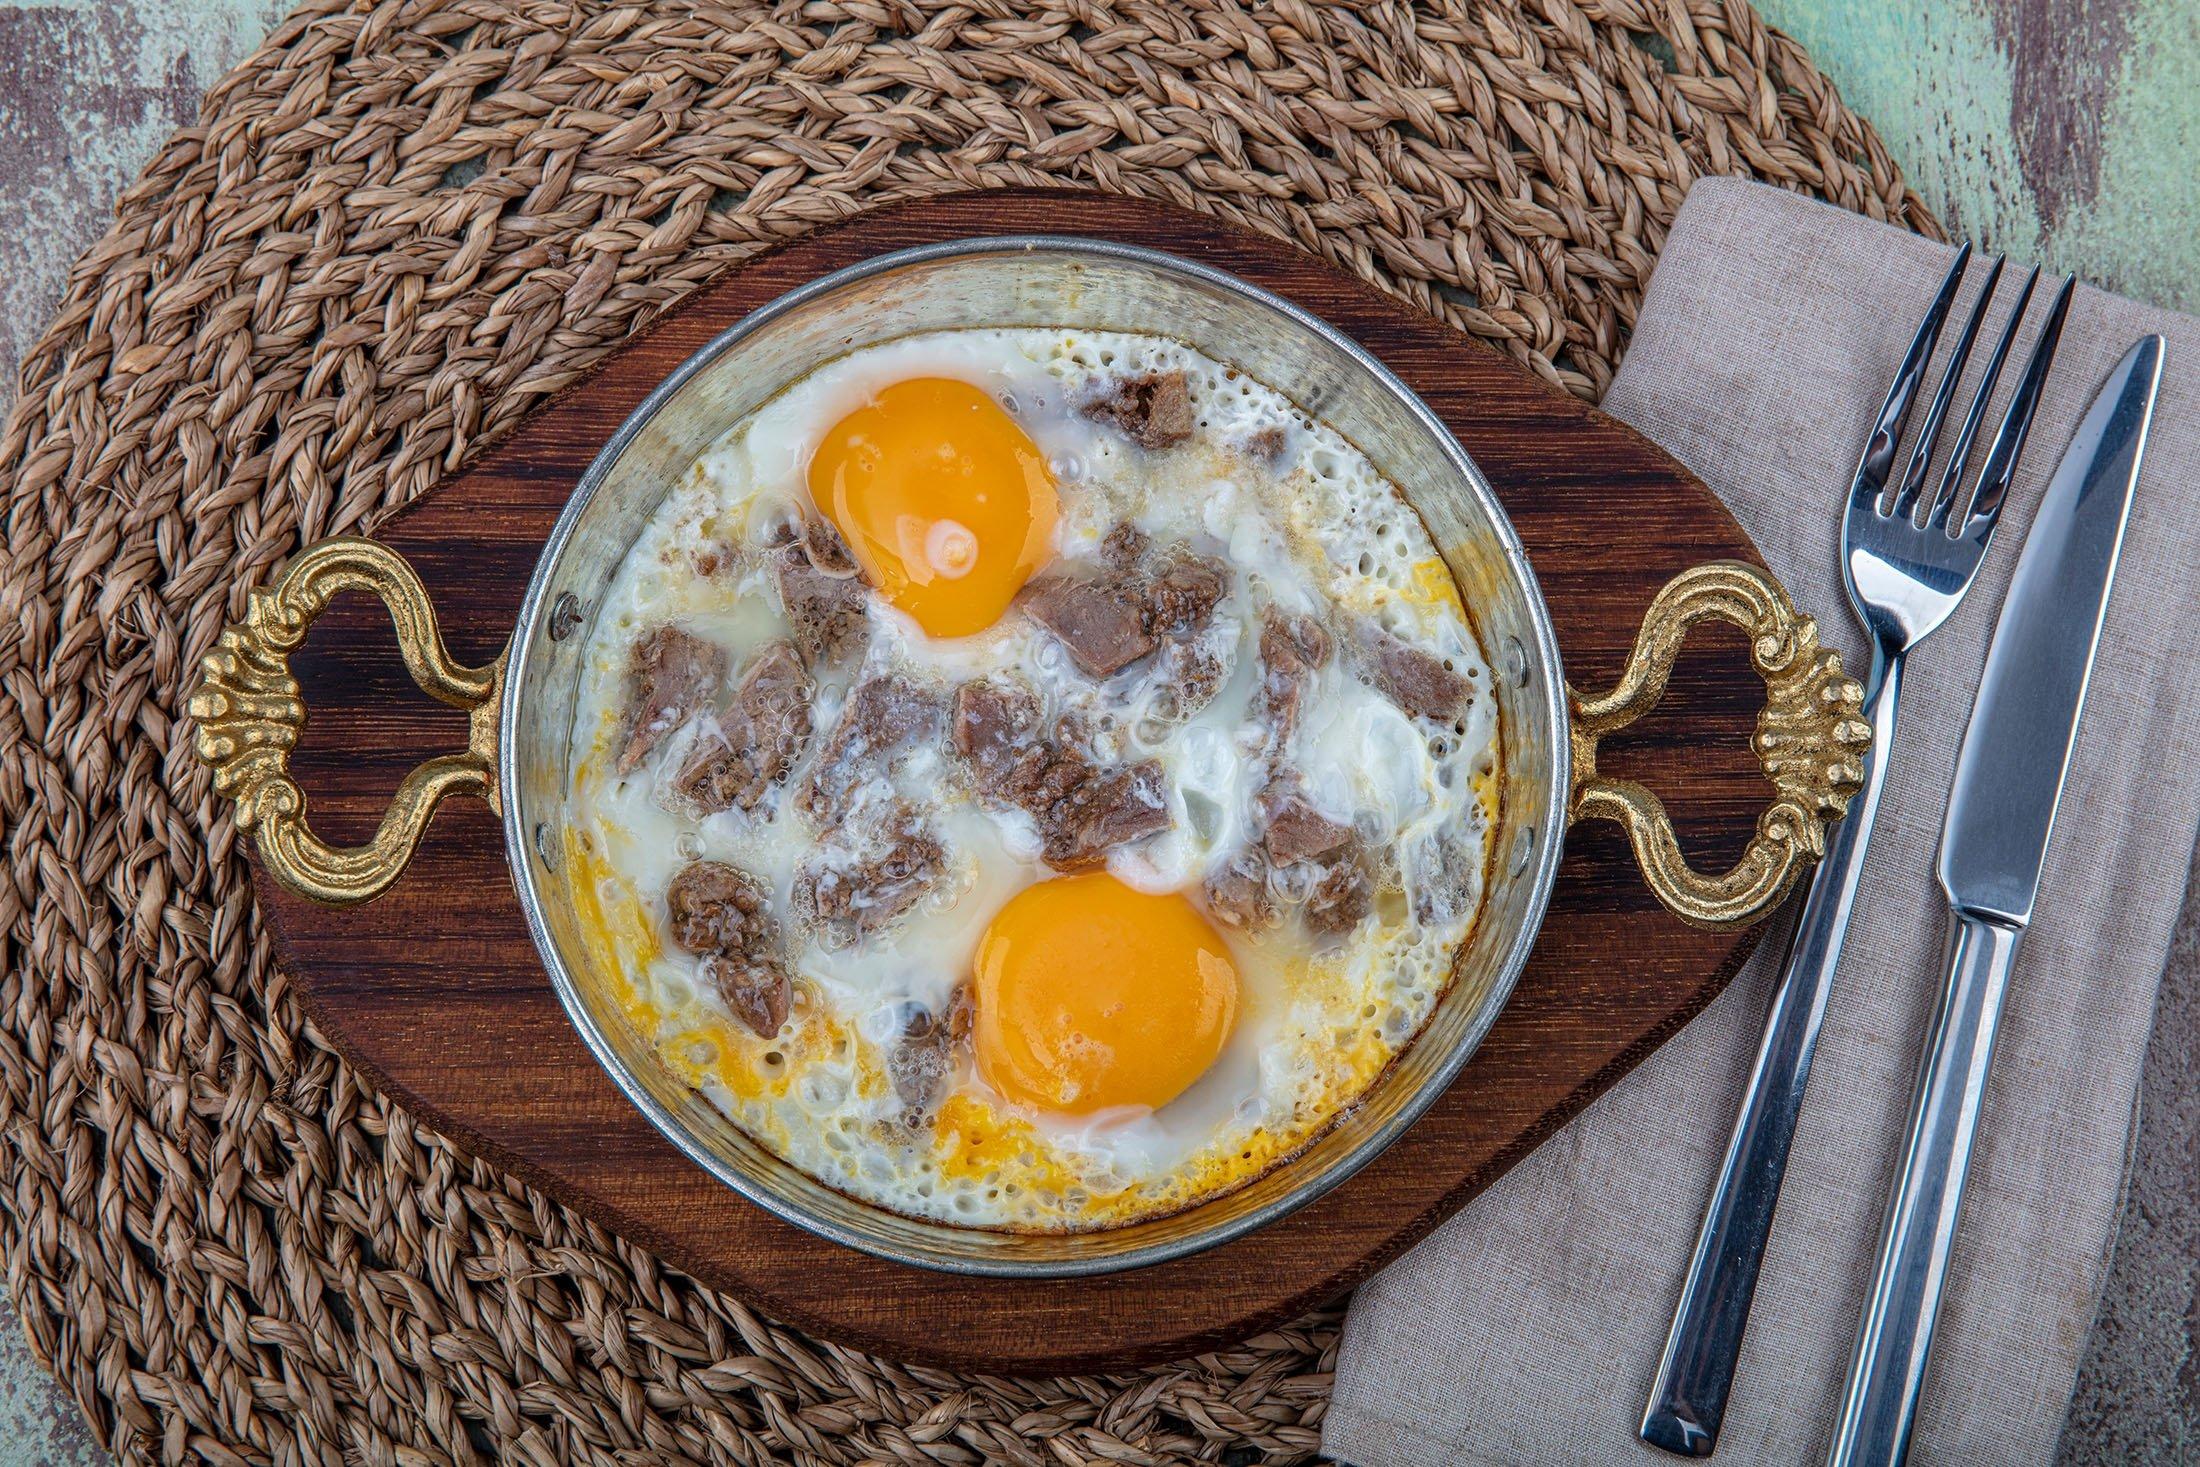 Turkish scrambled eggs with kavurma. (Shutterstock Photo)